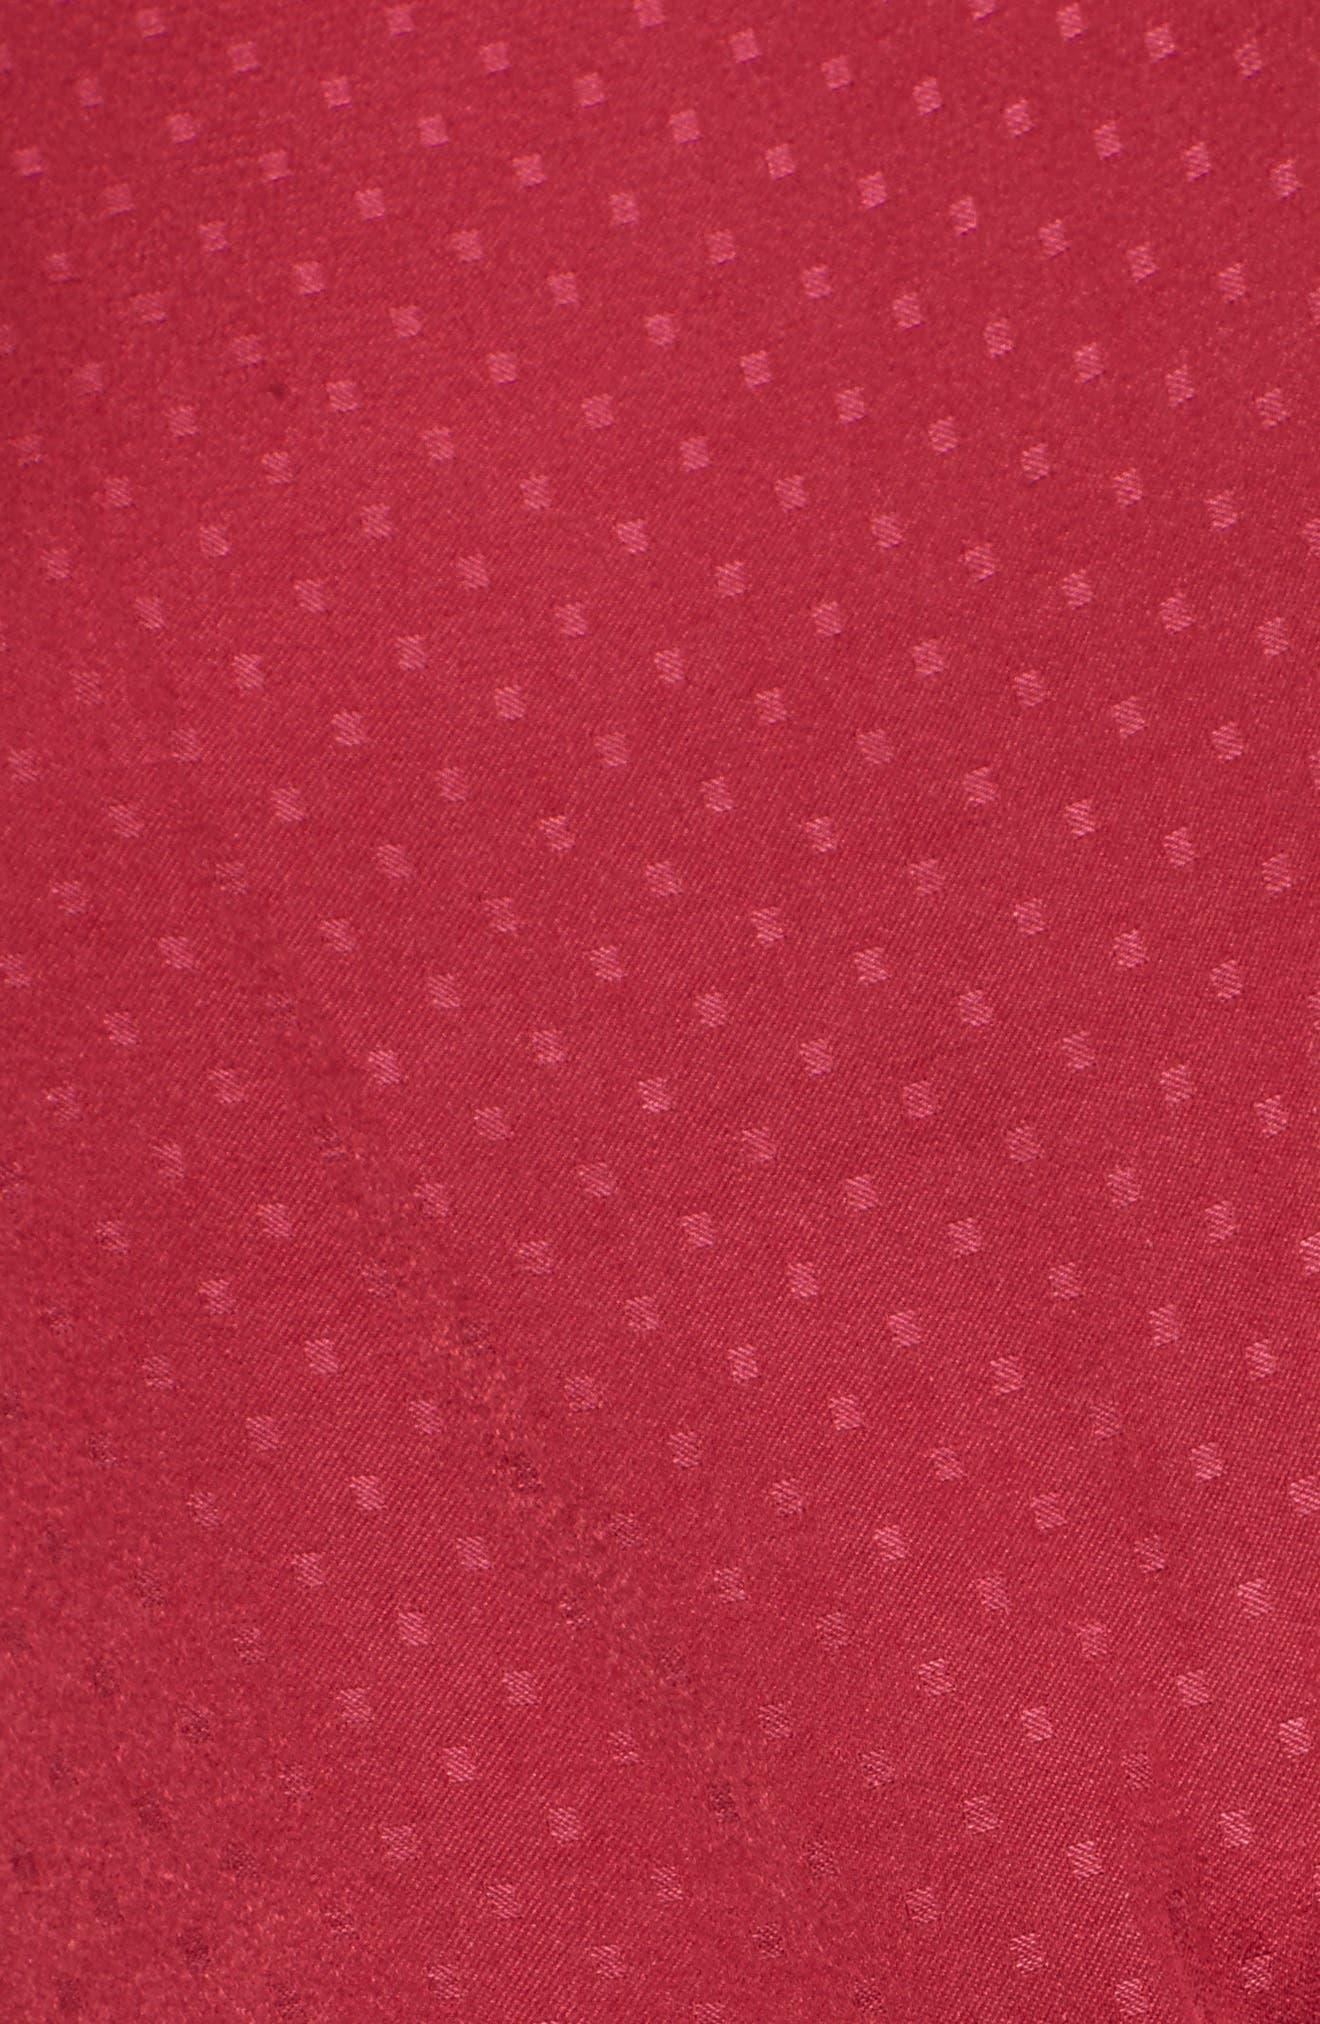 Plum Sleeveless Top,                             Alternate thumbnail 5, color,                             650